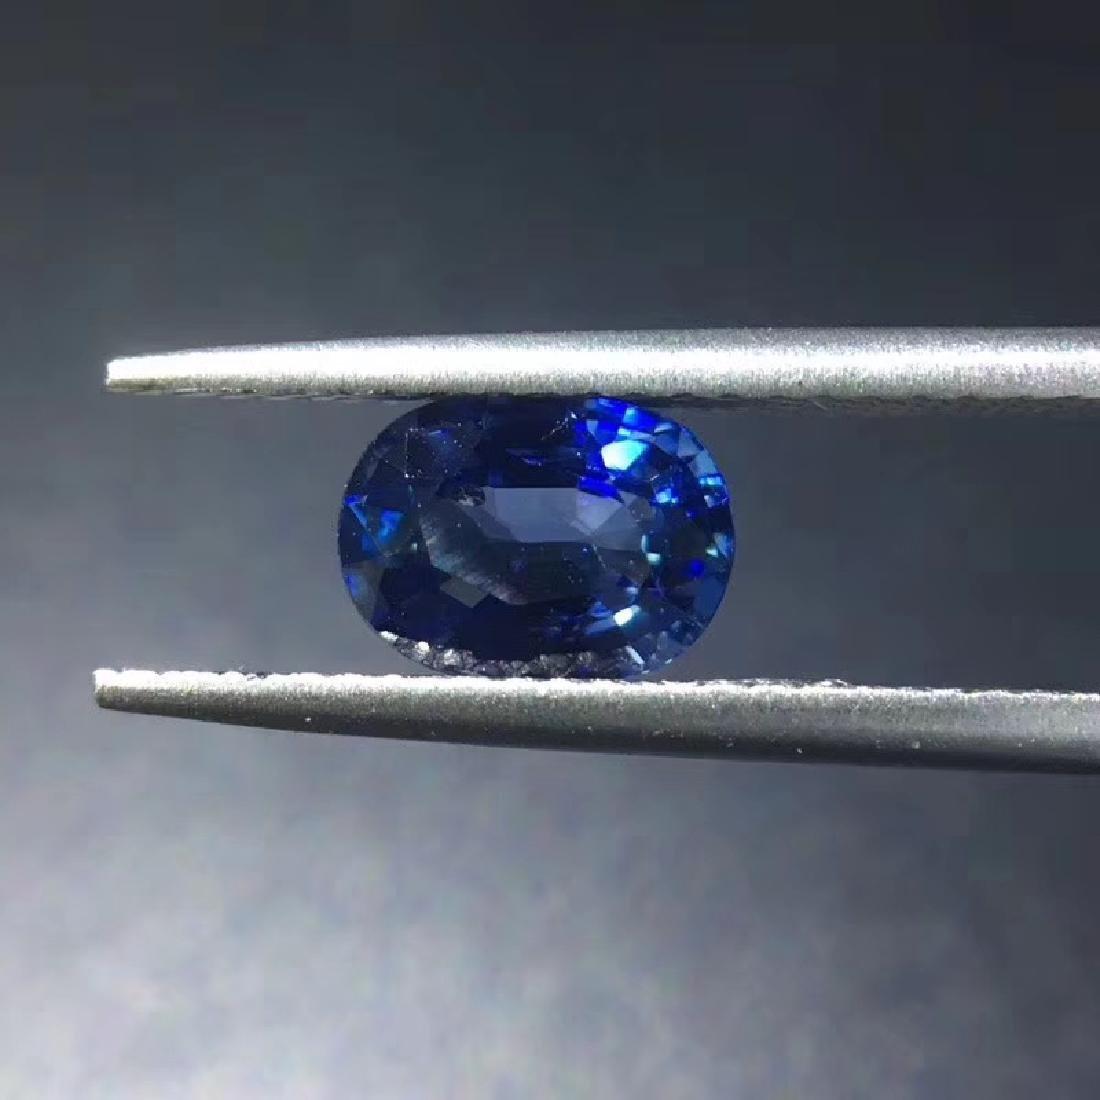 1.38 ct Sapphire 5.5*7.4*3.5 mm Oval Cut